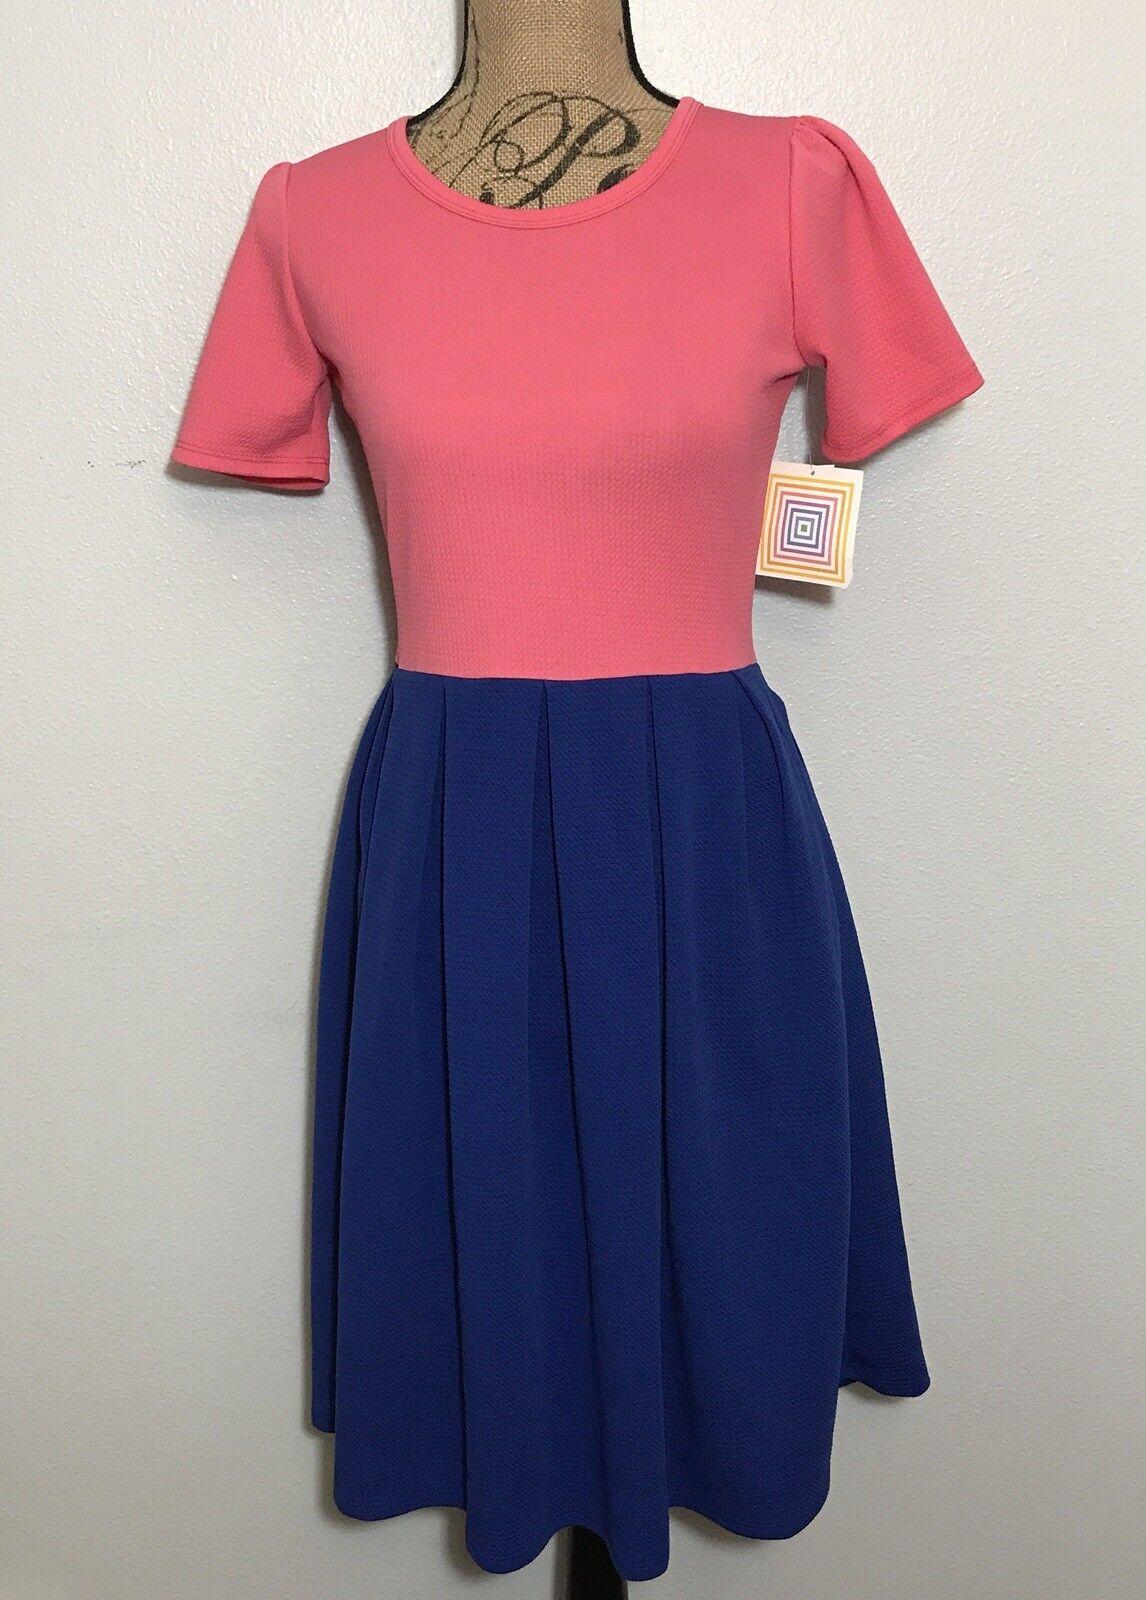 NWT LuLaRoe Amelia SOLID Blau Rosa Farbeblock Dress Rare Unicorn Größe S Small